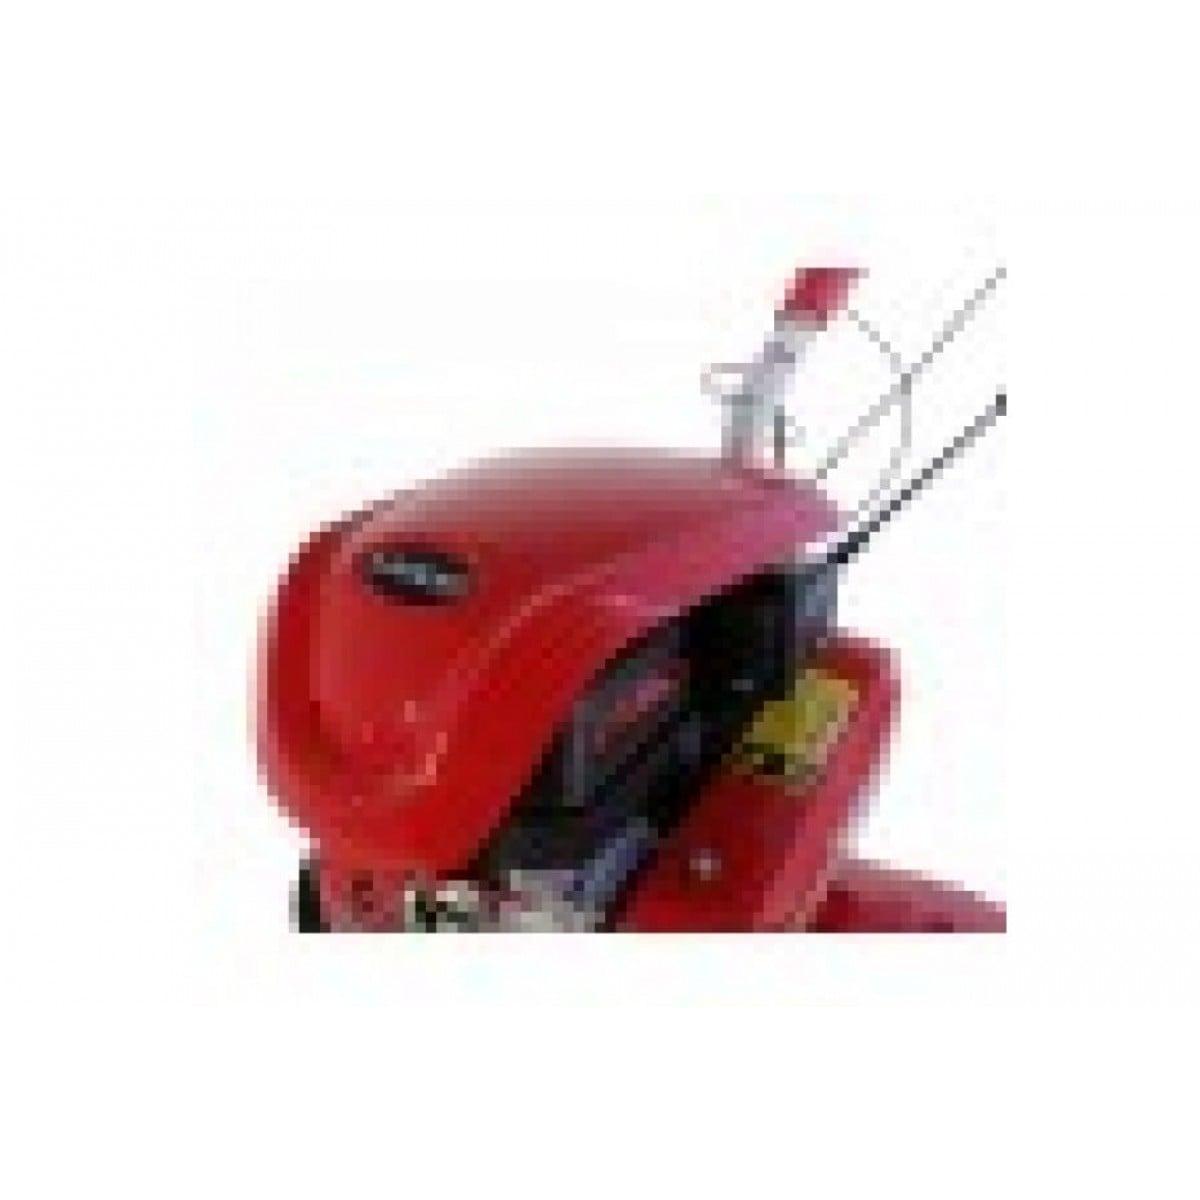 motocultor loncin lc750 7cp o mac.ro 9 2 54